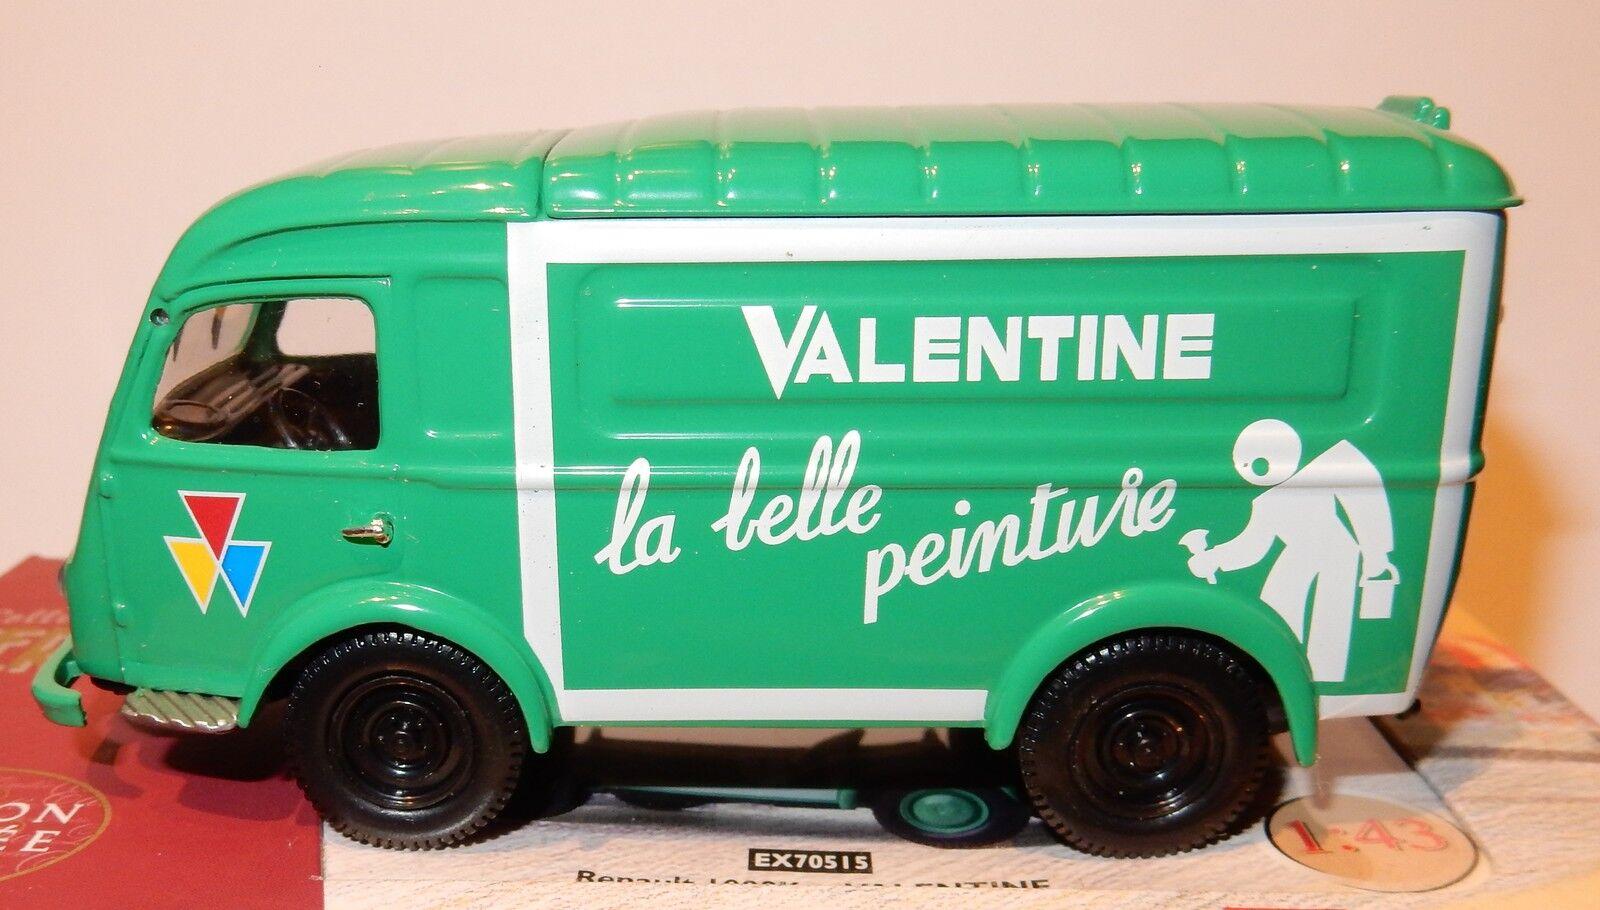 CORGI HERITAGE RENAULT 1000 KG VALENTINE VALENTINE VALENTINE LA BELLE PEINTURE 1 43 IN BOX c61e31